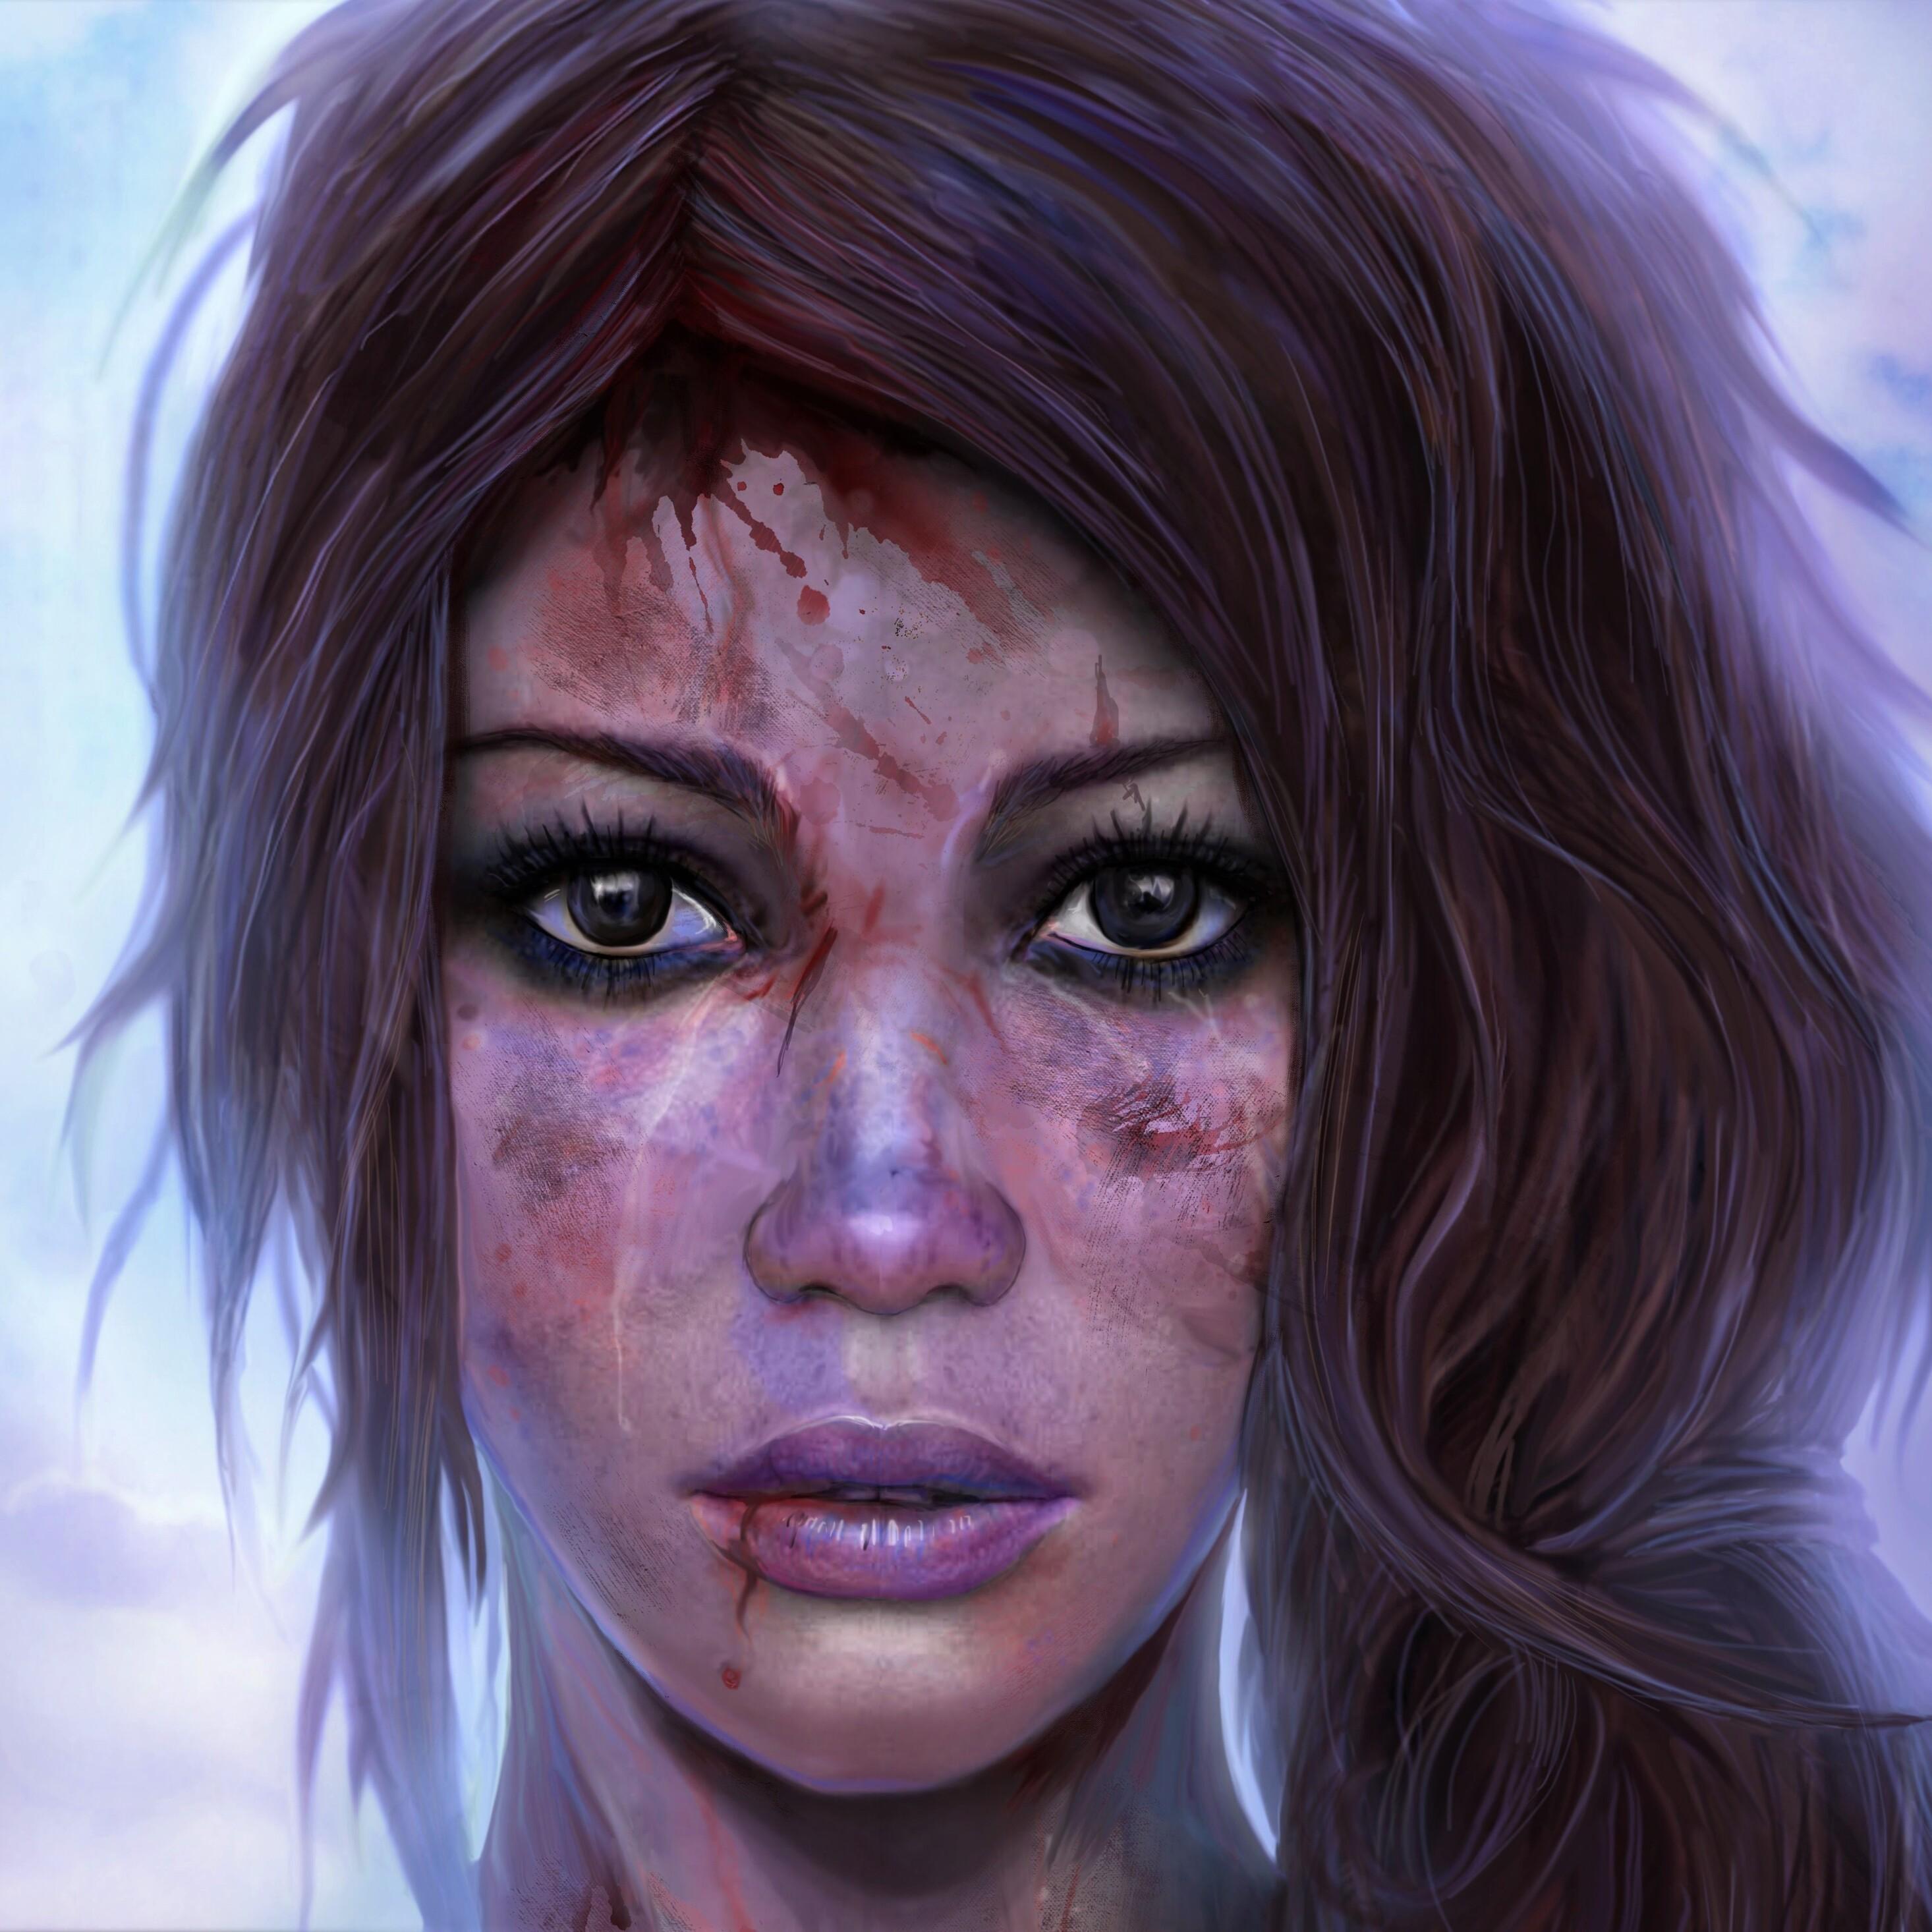 lara-croft-artistic-artwork-4k-7h.jpg